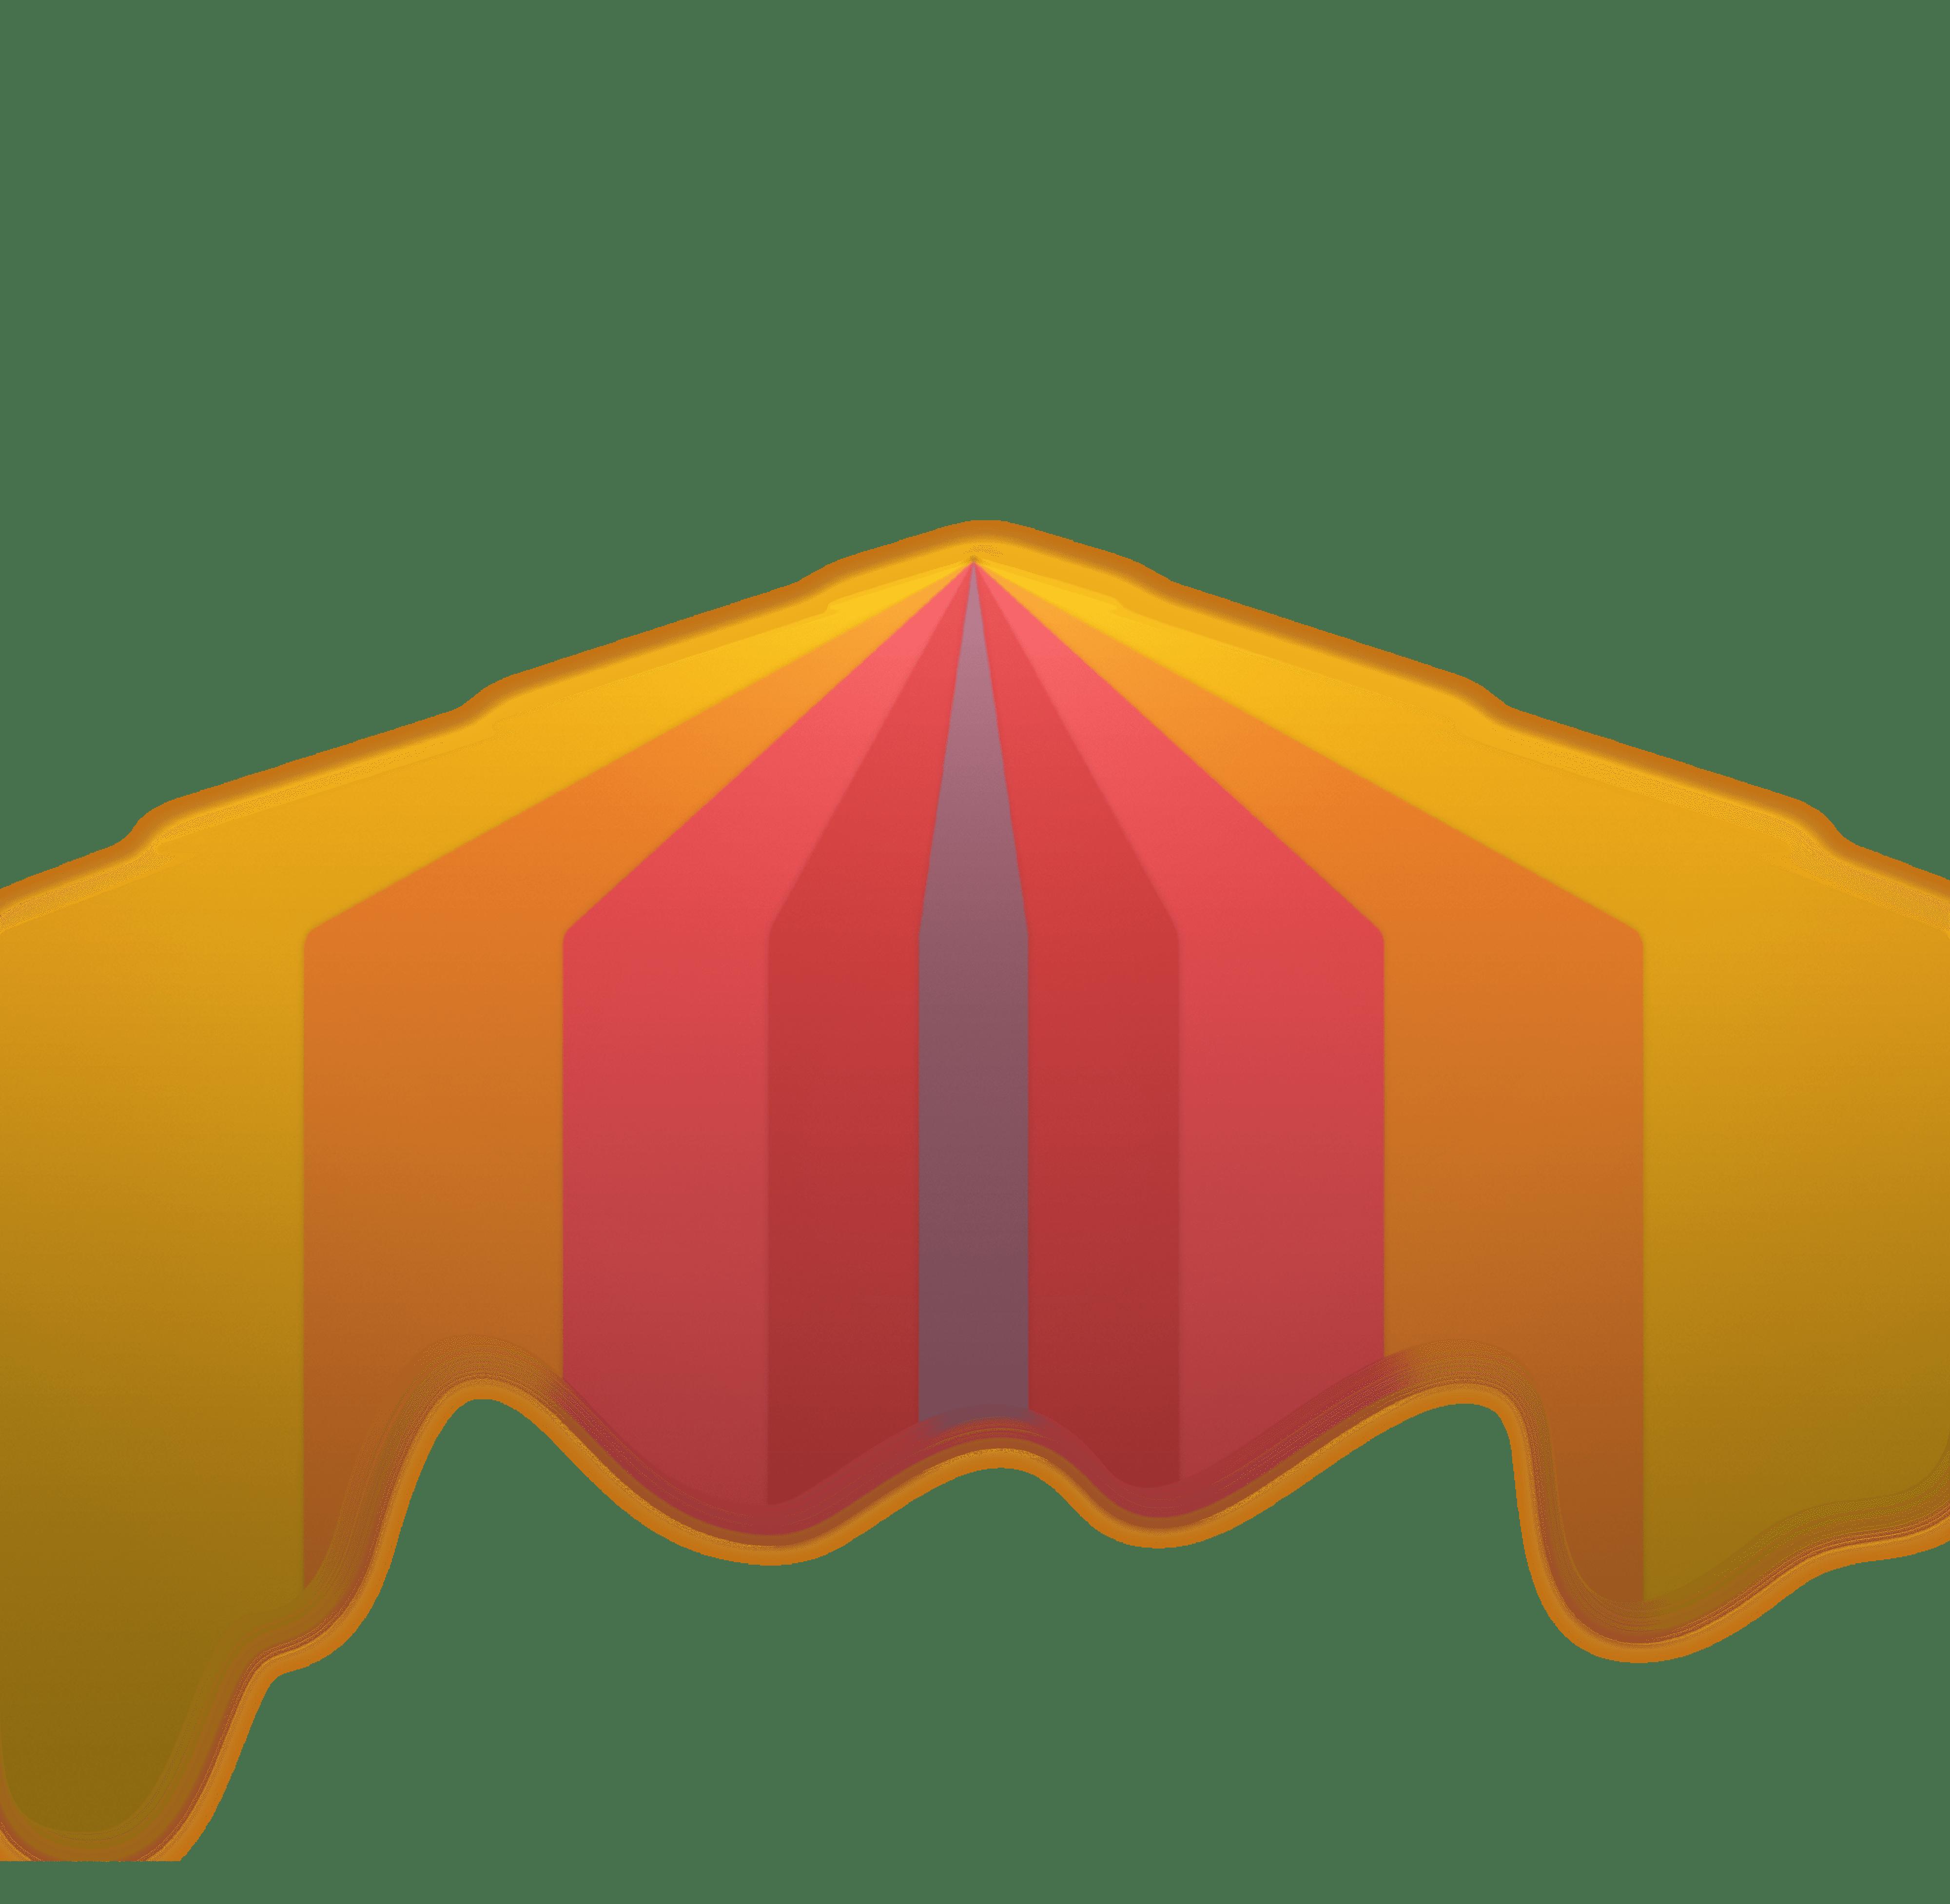 Light Warriors United rainbow light rays emanating from center of logo